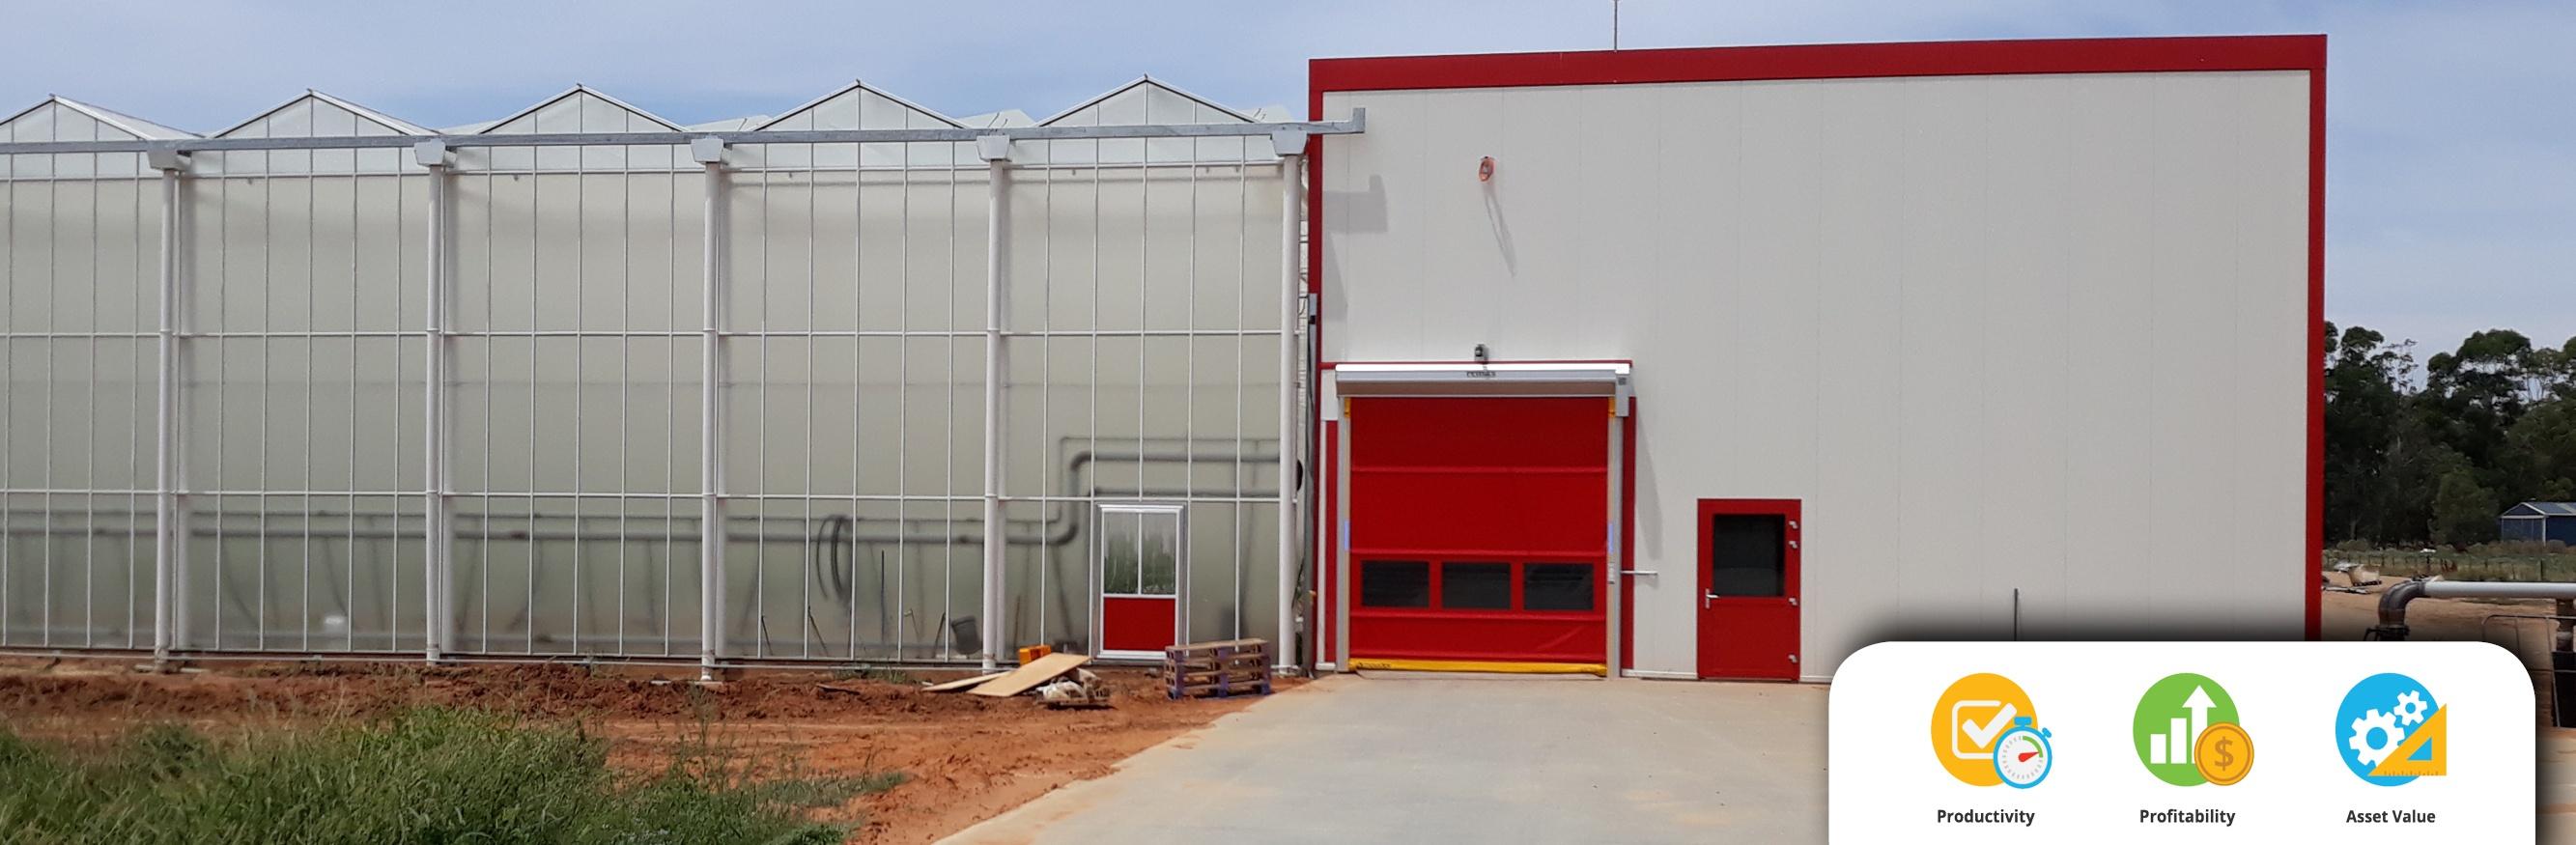 Movidor Rapid Door at Hydroponic Greenhouse